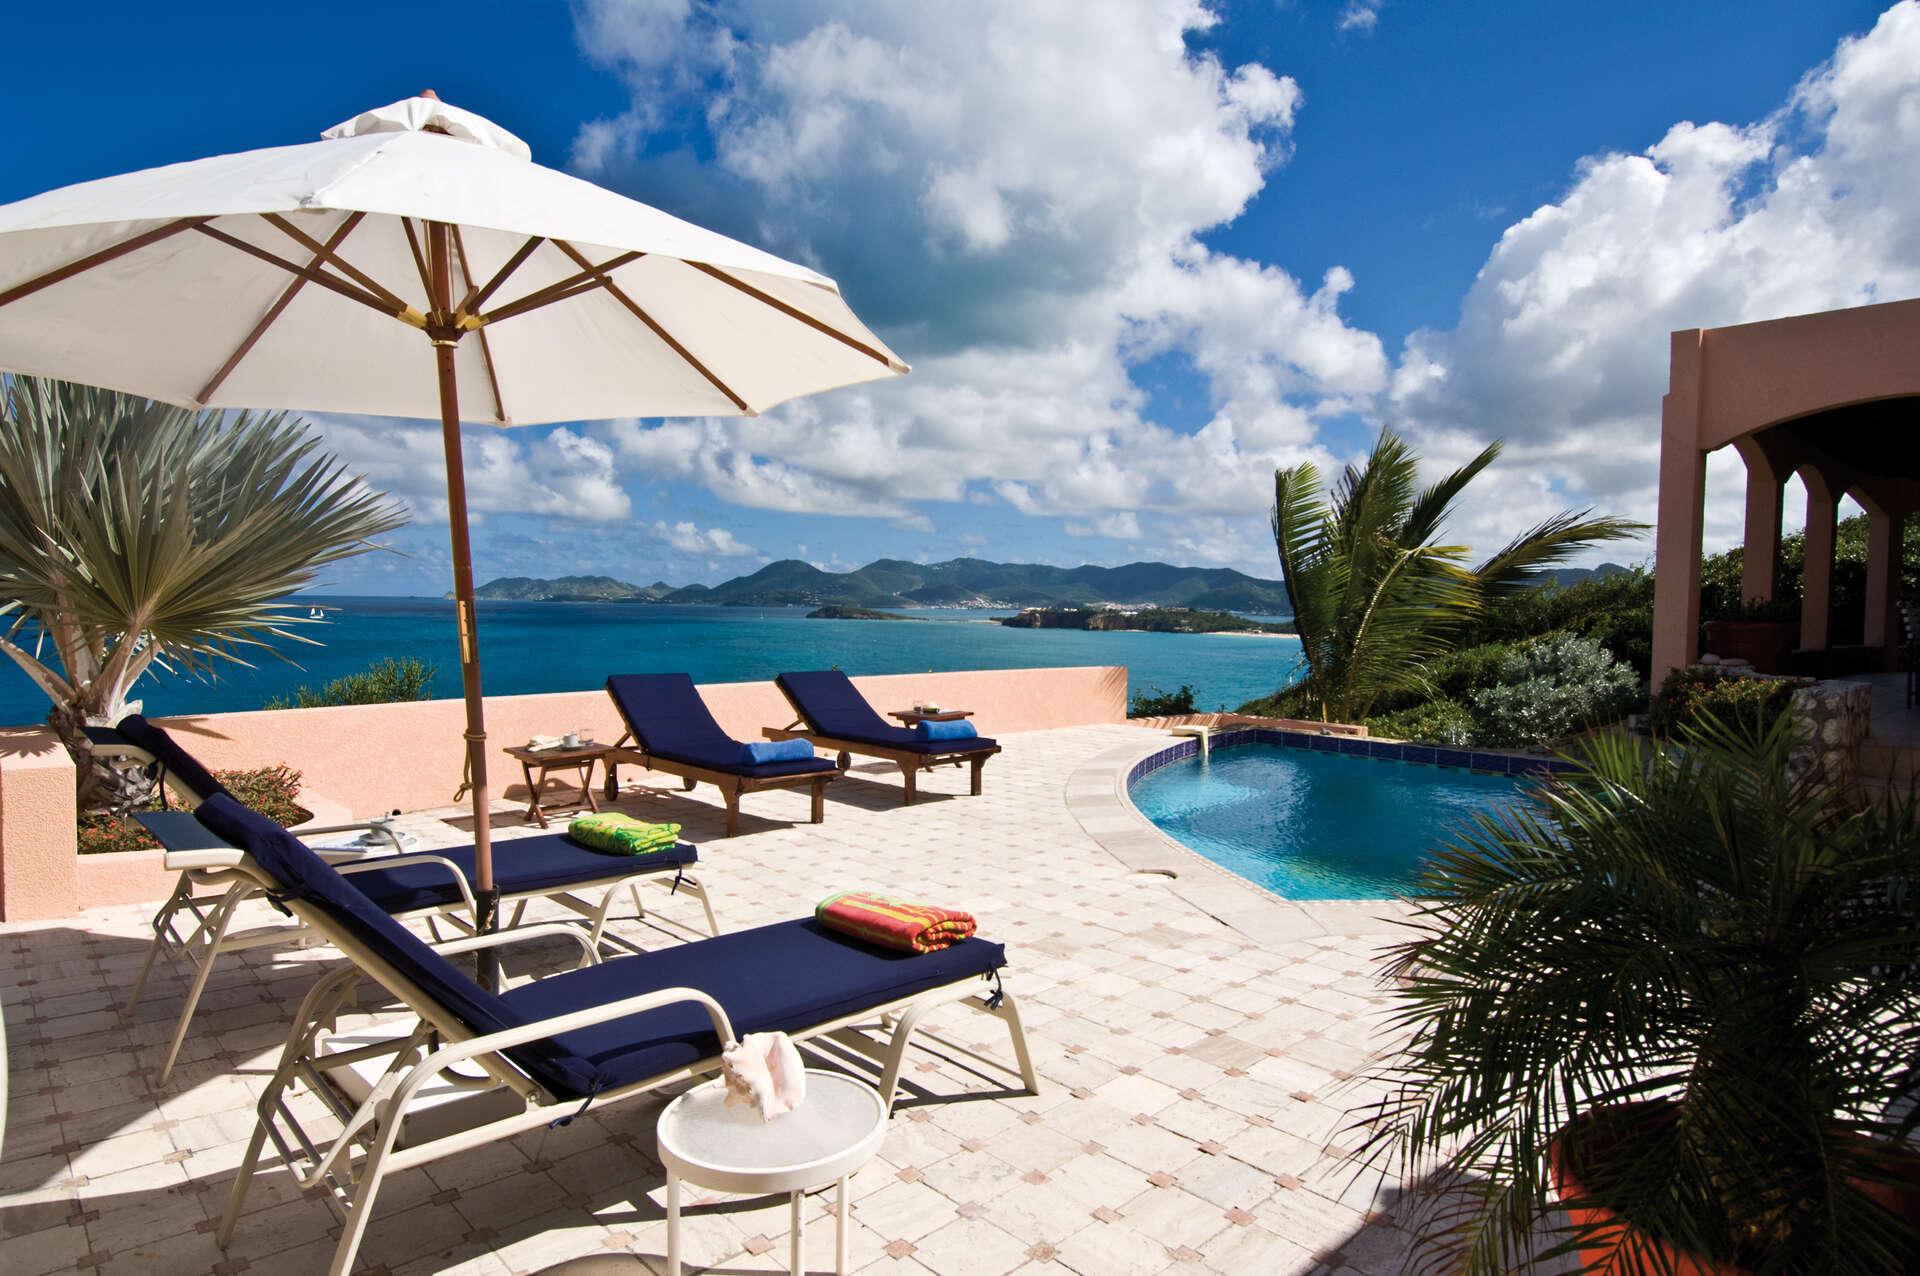 Luxury villa rentals caribbean - St martin - Saint martin french - Les terres basses - Mongoose Run - Image 1/12